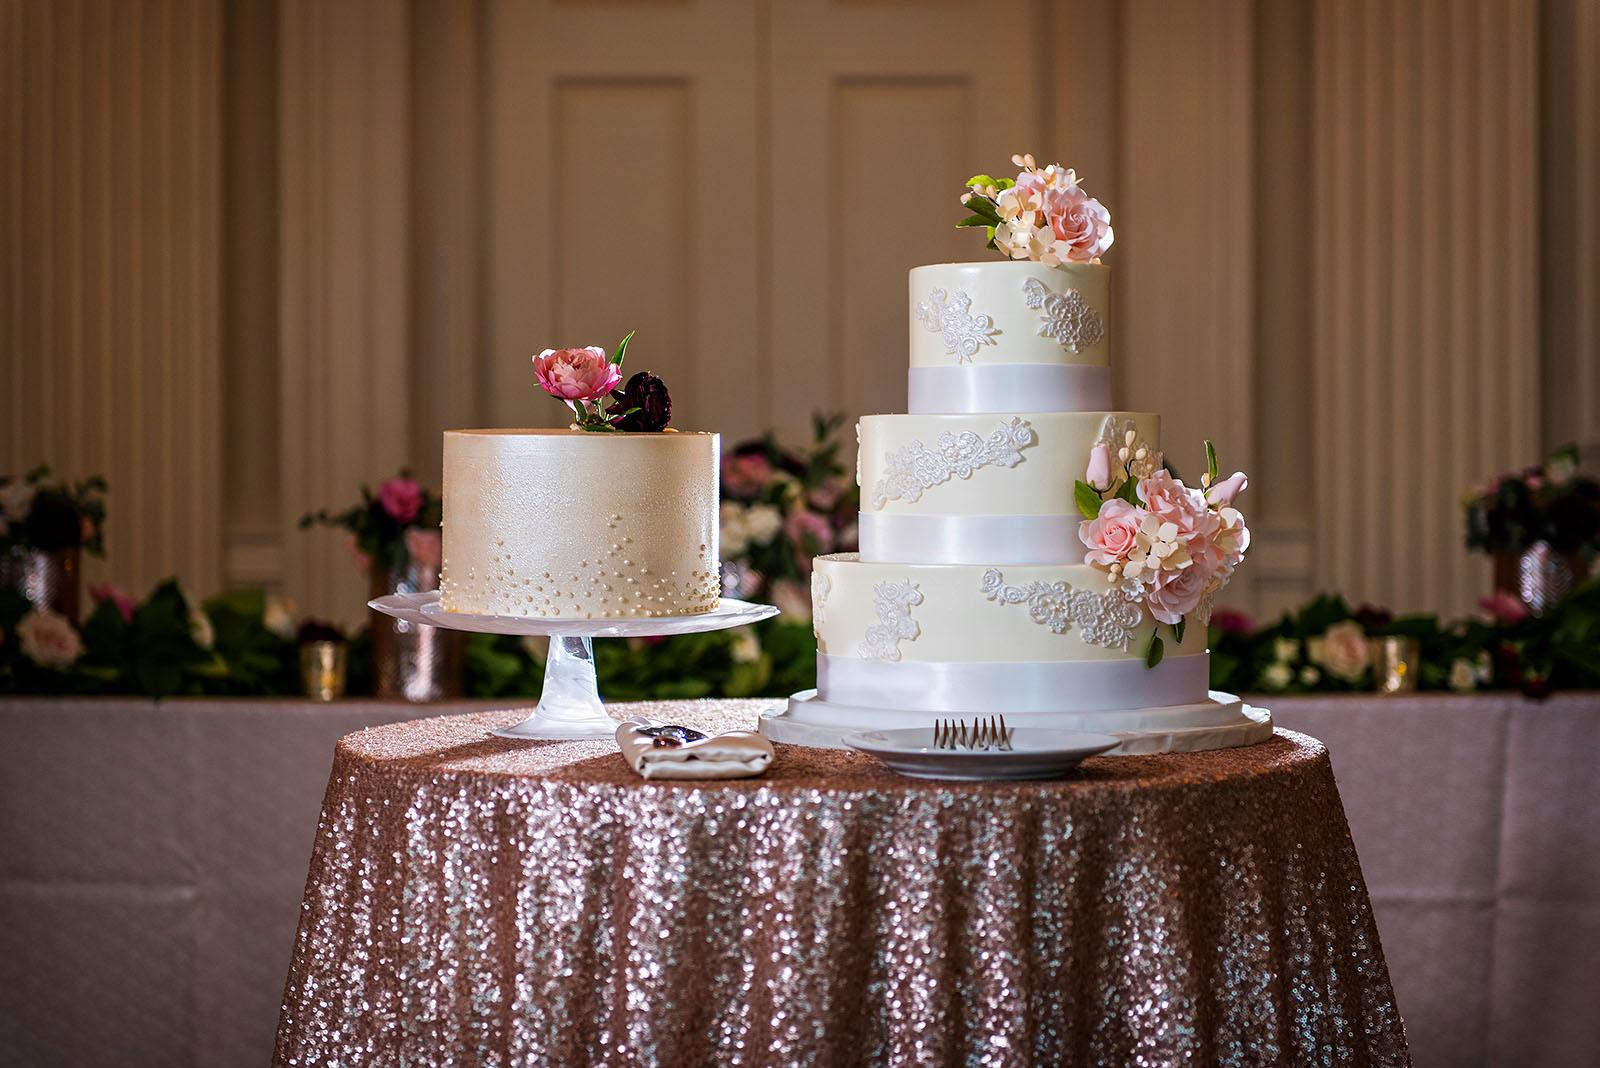 Chicago History Museum Gluten Free Wedding Cake